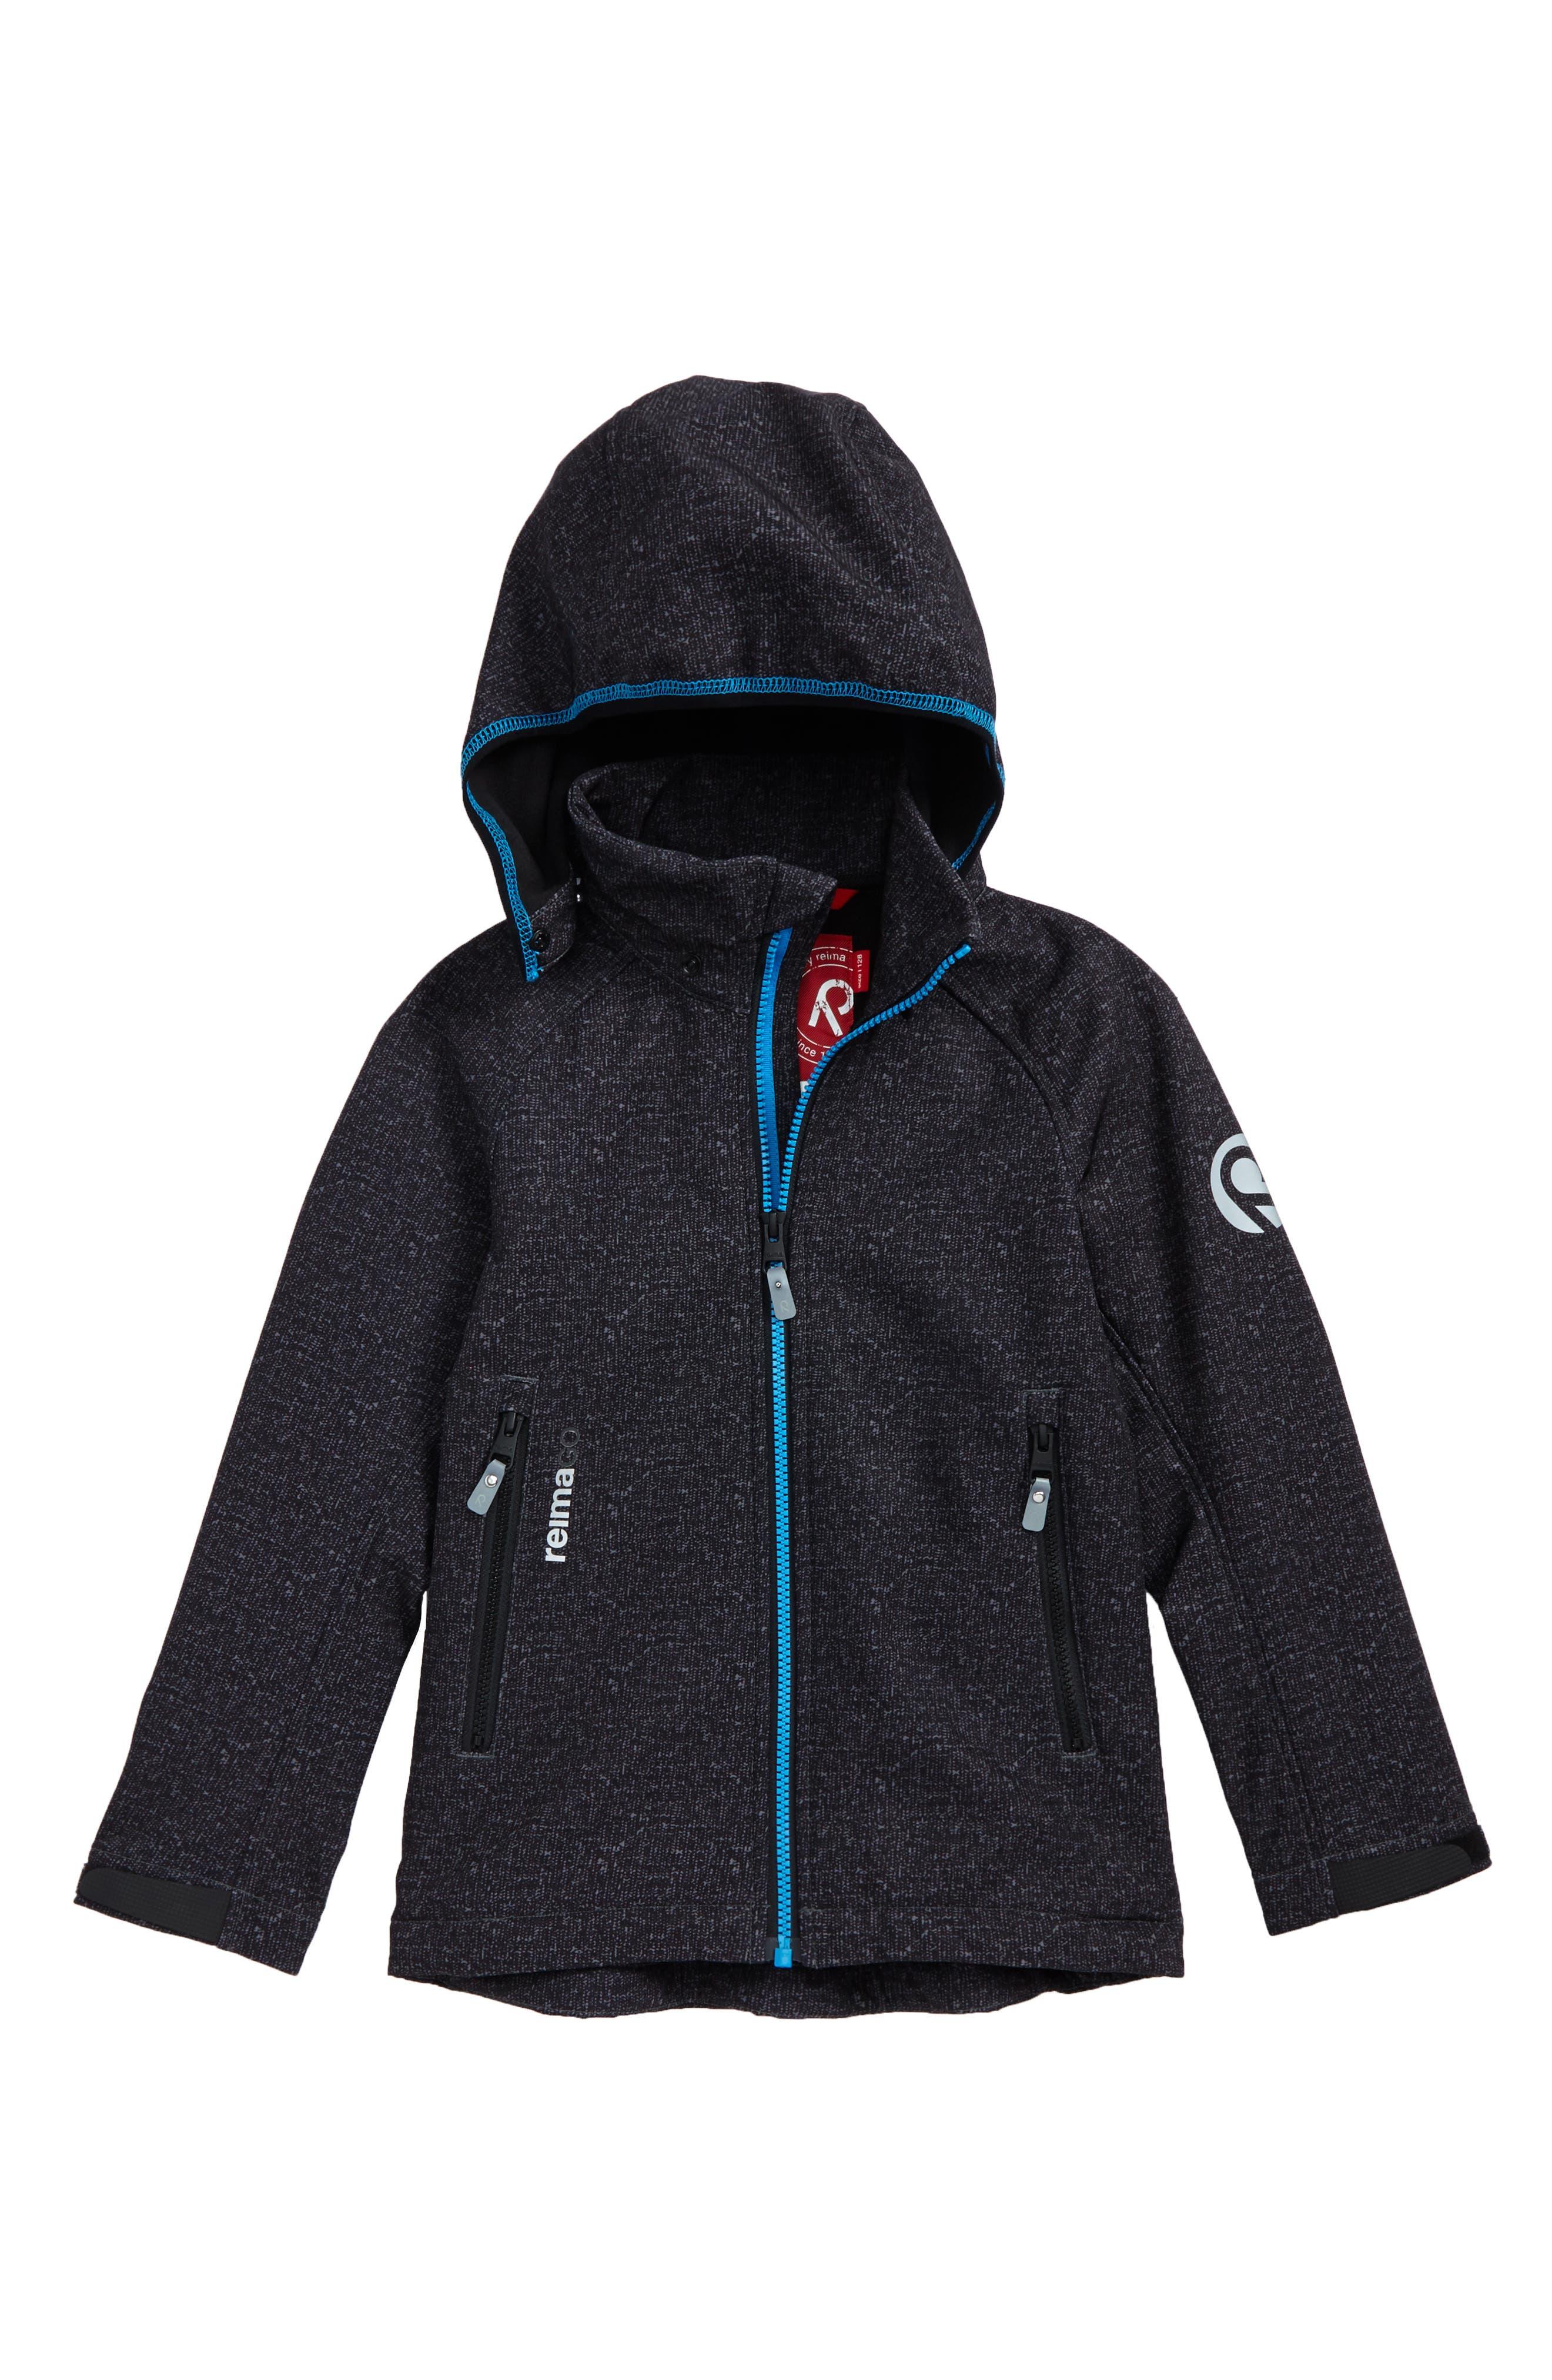 Zayak Waterproof Hooded Jacket,                             Main thumbnail 1, color,                             020